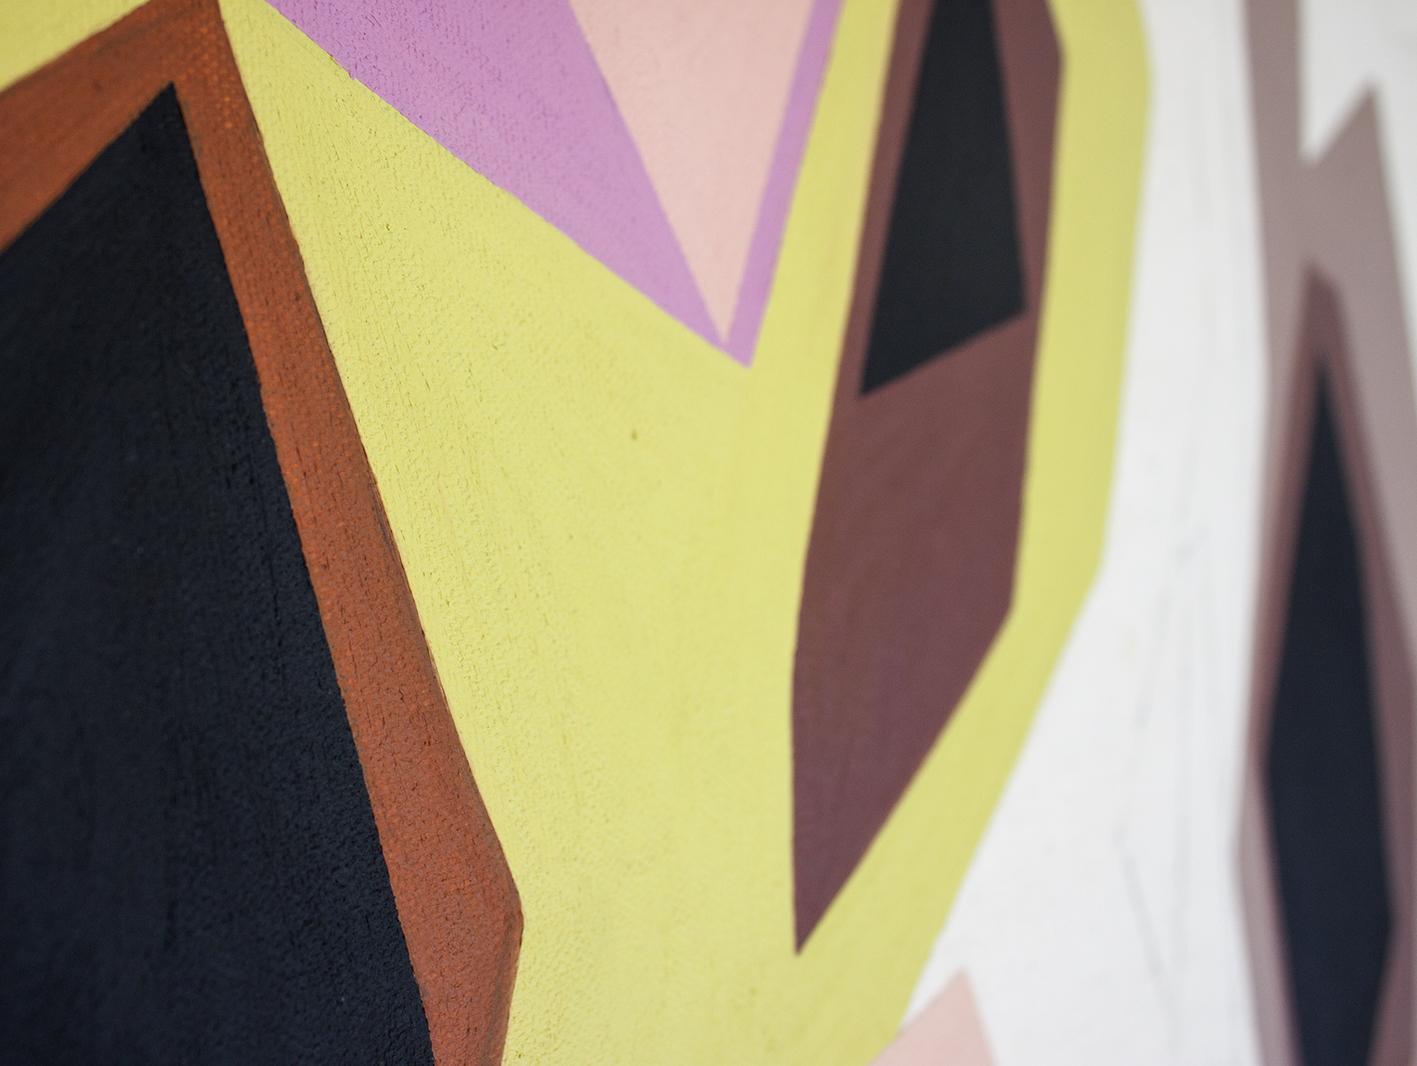 Madeline Young Australian artist - progress shots